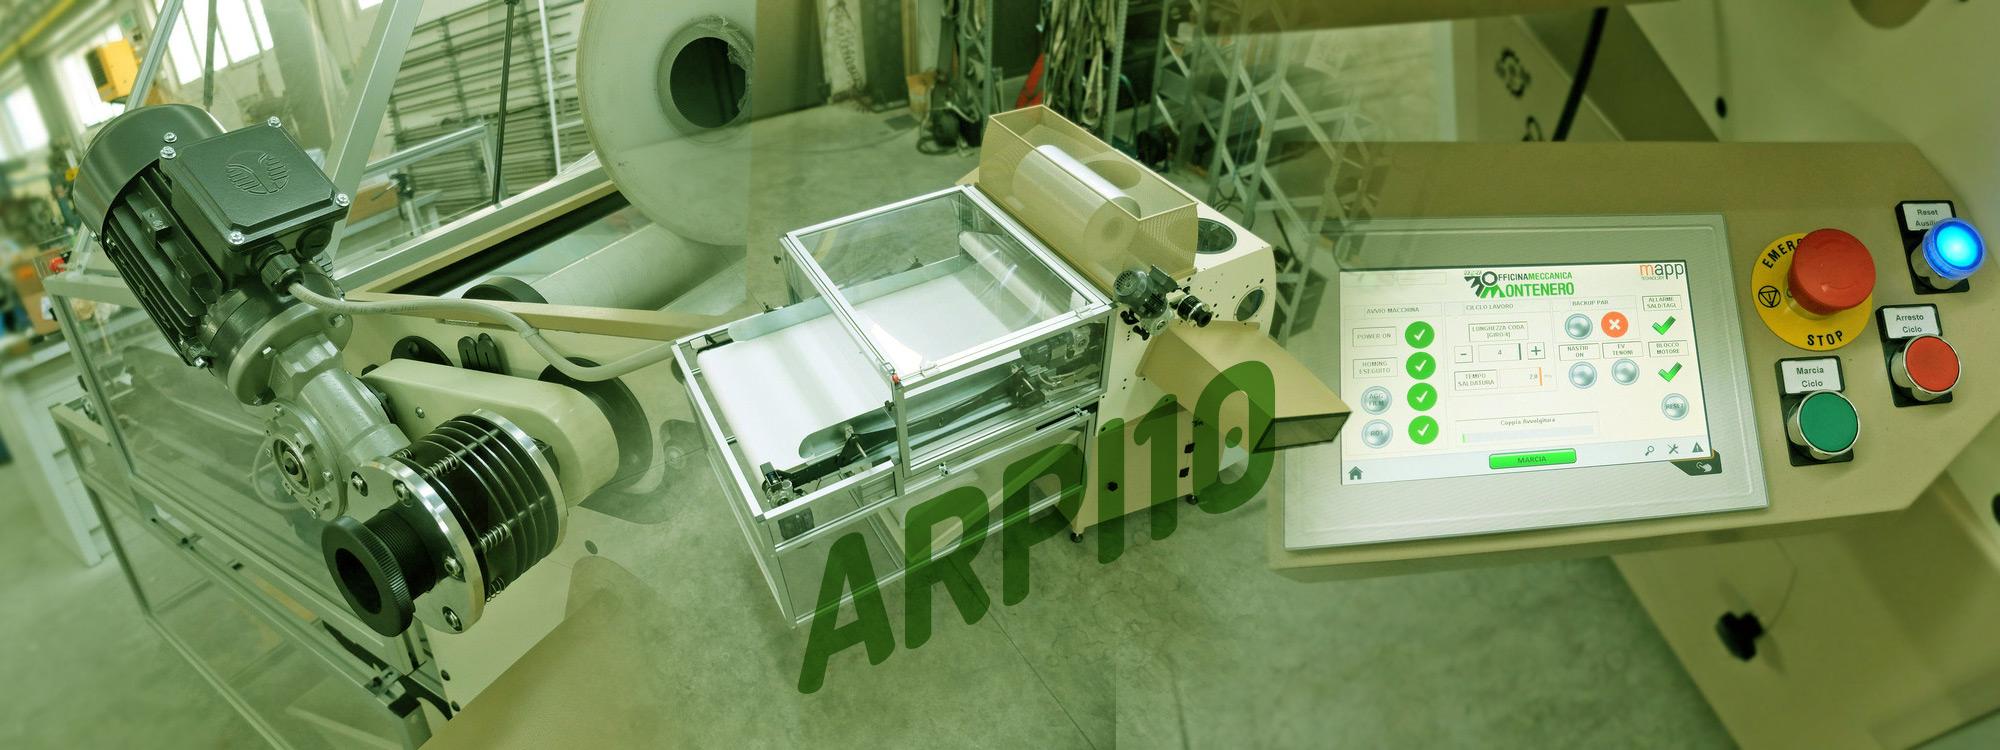 Arrotolatore ARPI 10 - Montenero